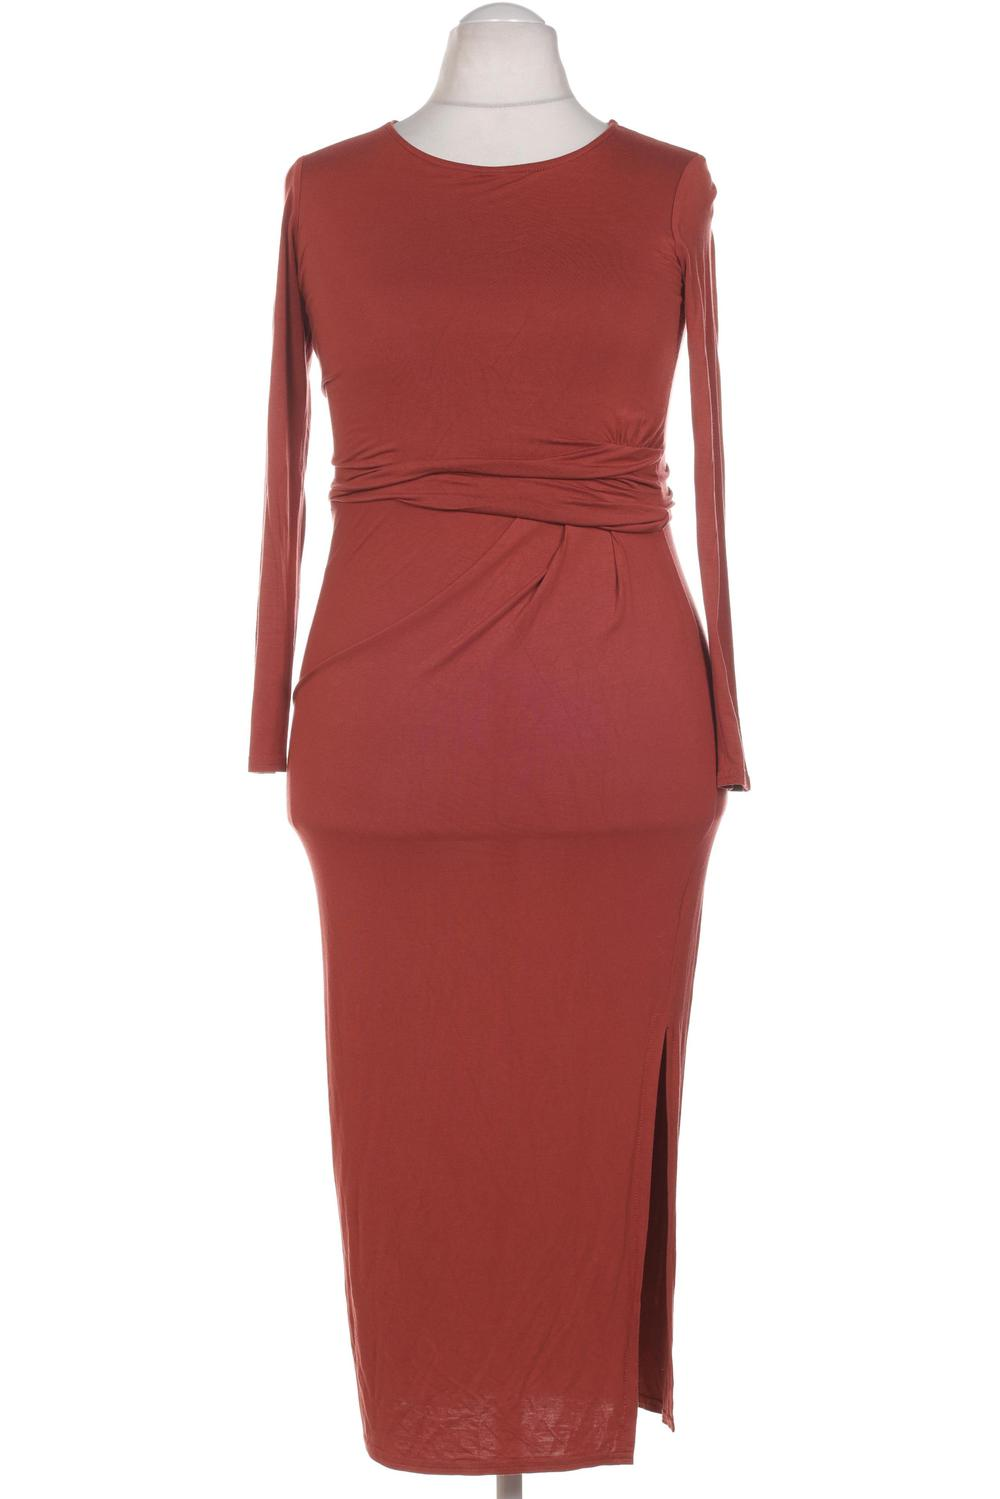 asos Damen Kleid EUR 9 Second Hand kaufen   ubup